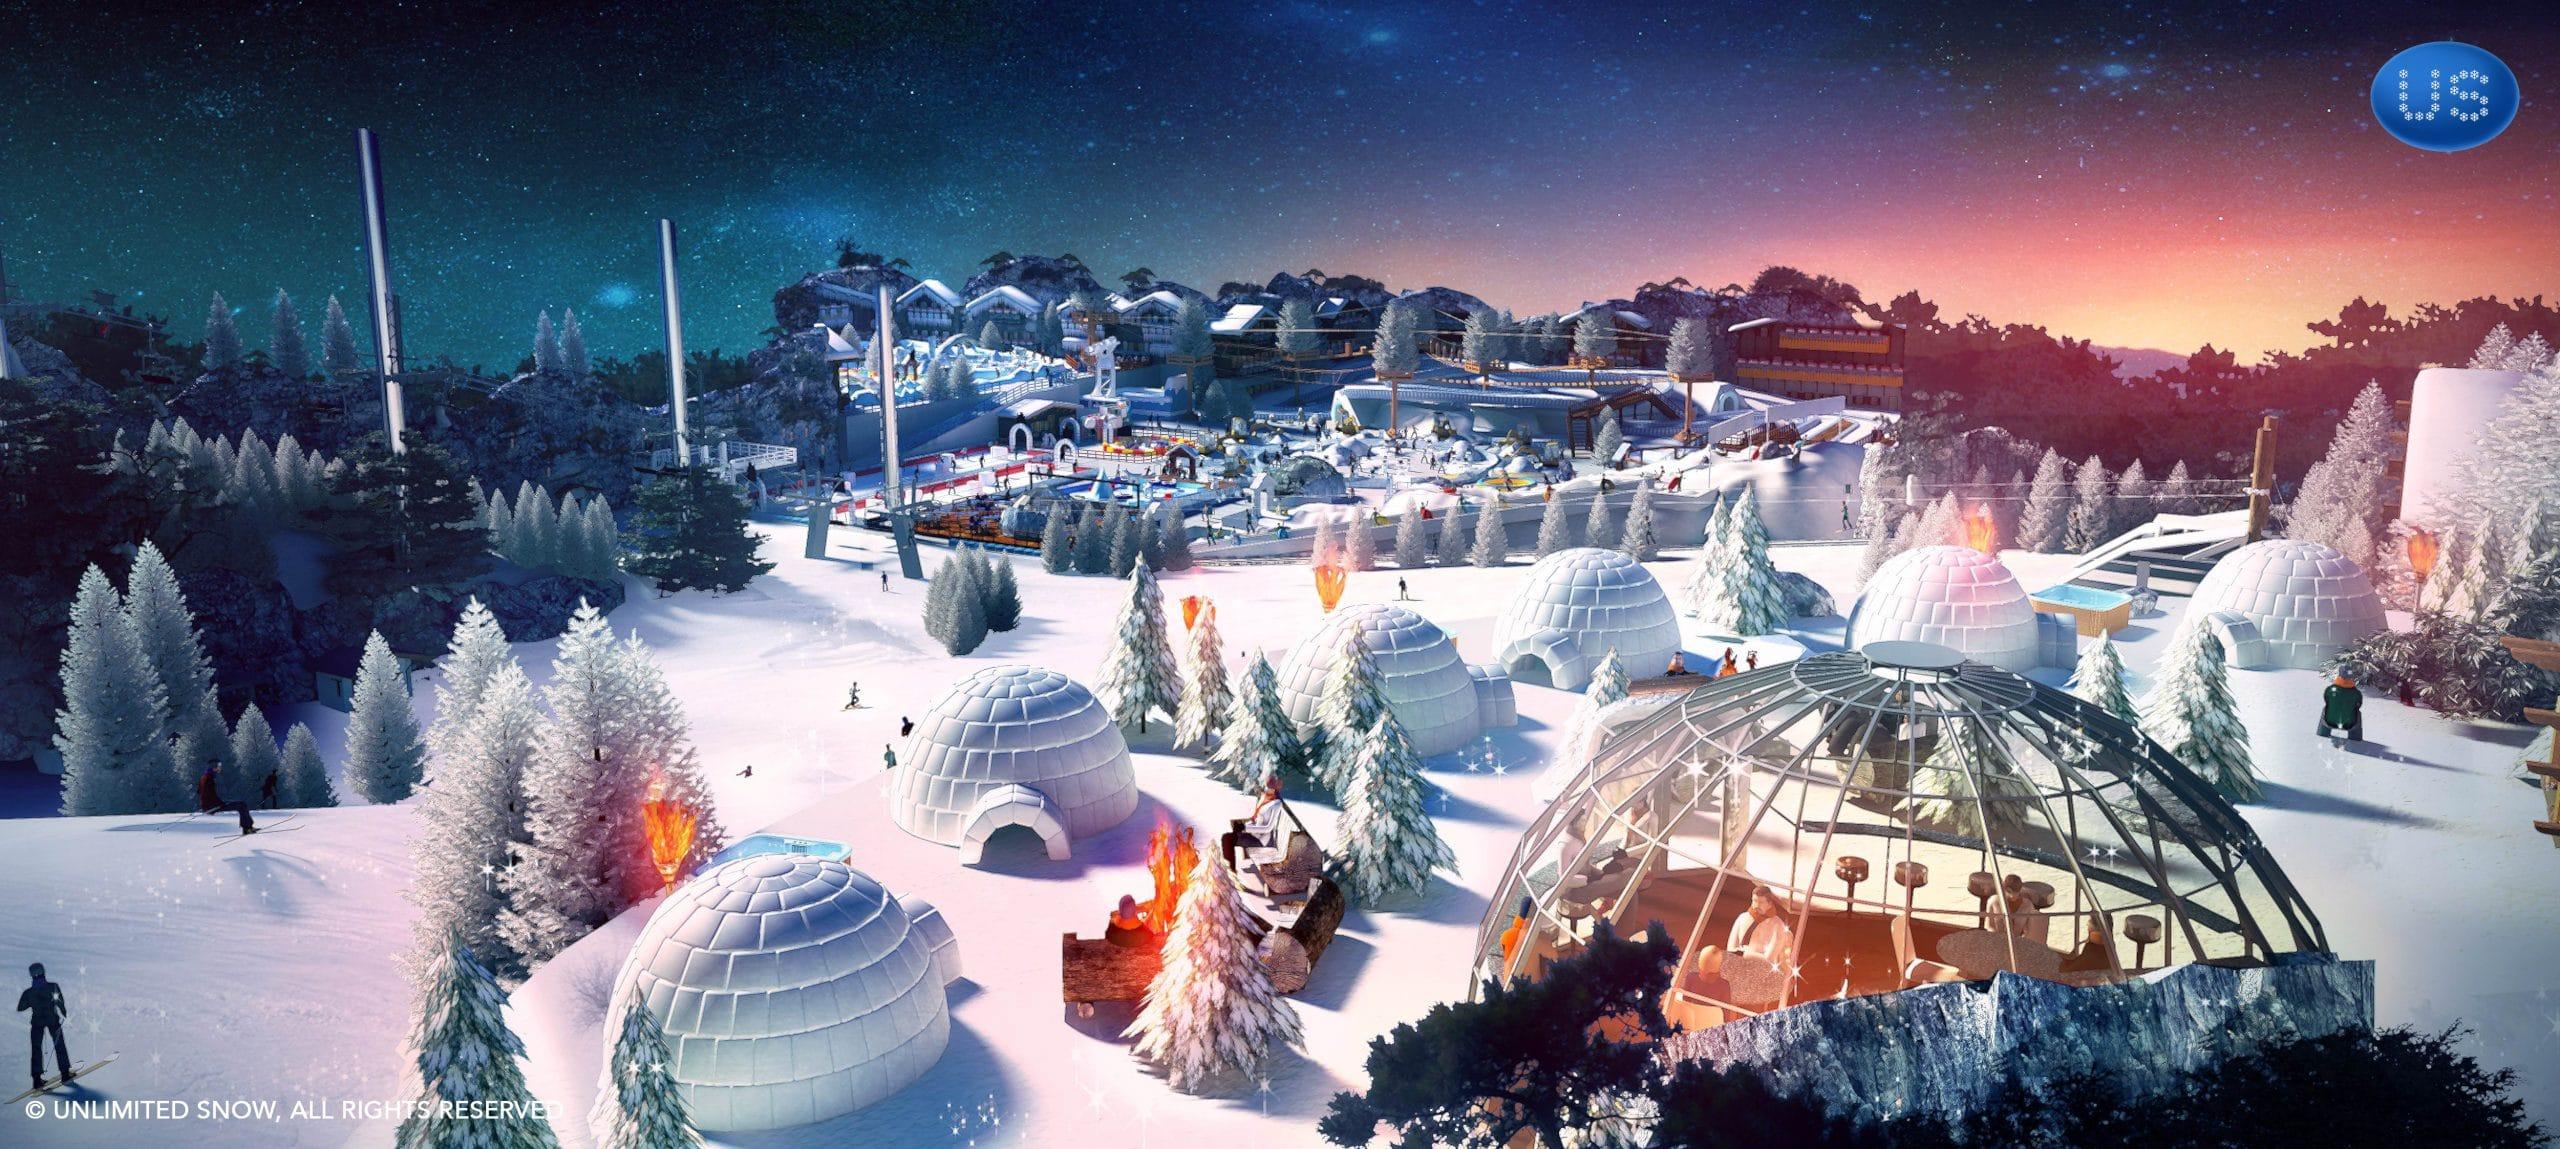 https://www.giebrostechnics.nl/wp-content/uploads/2020/07/Unlimited-Snow_Photo_1-scaled.jpg